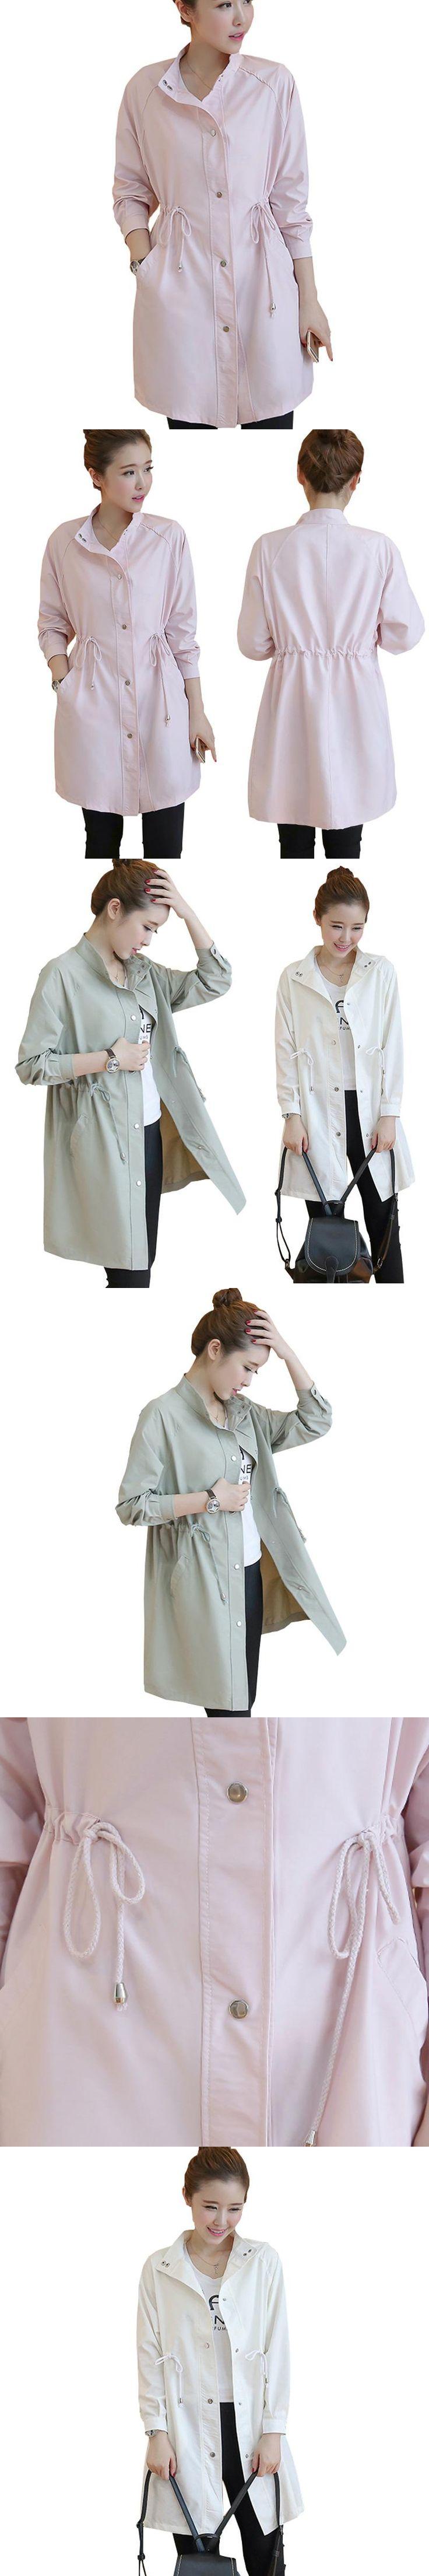 Singel Breasted Md-long Trench Coat Women 2016 New Fashion Cloak Polerones Mujer Windbreaker Female Abrigos